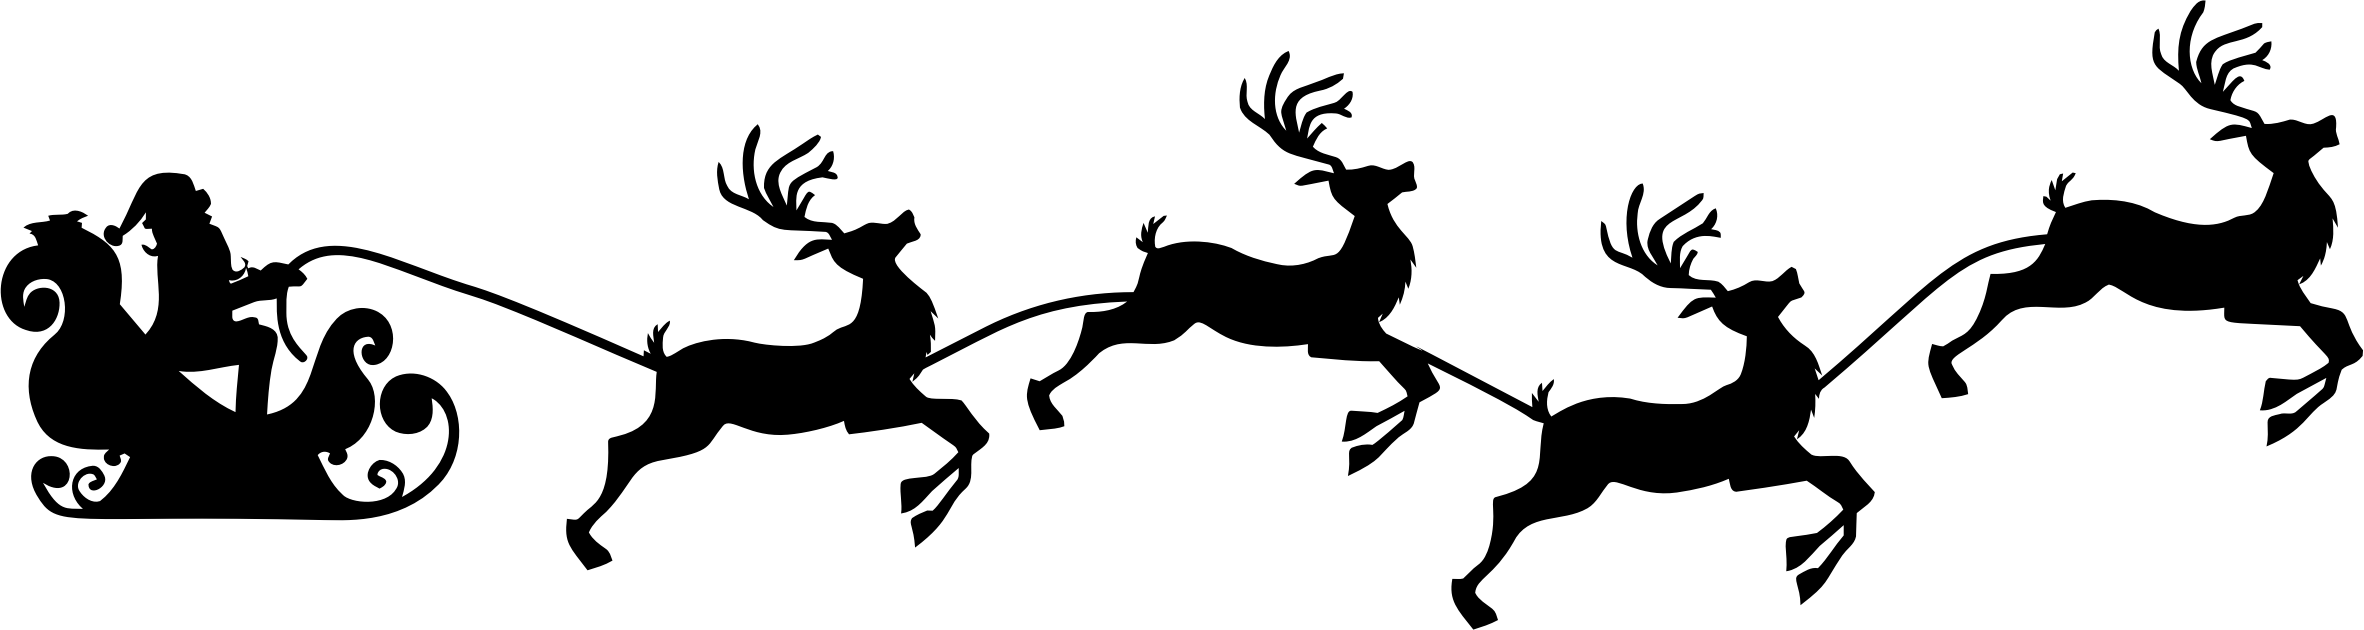 2364x630 Clipart